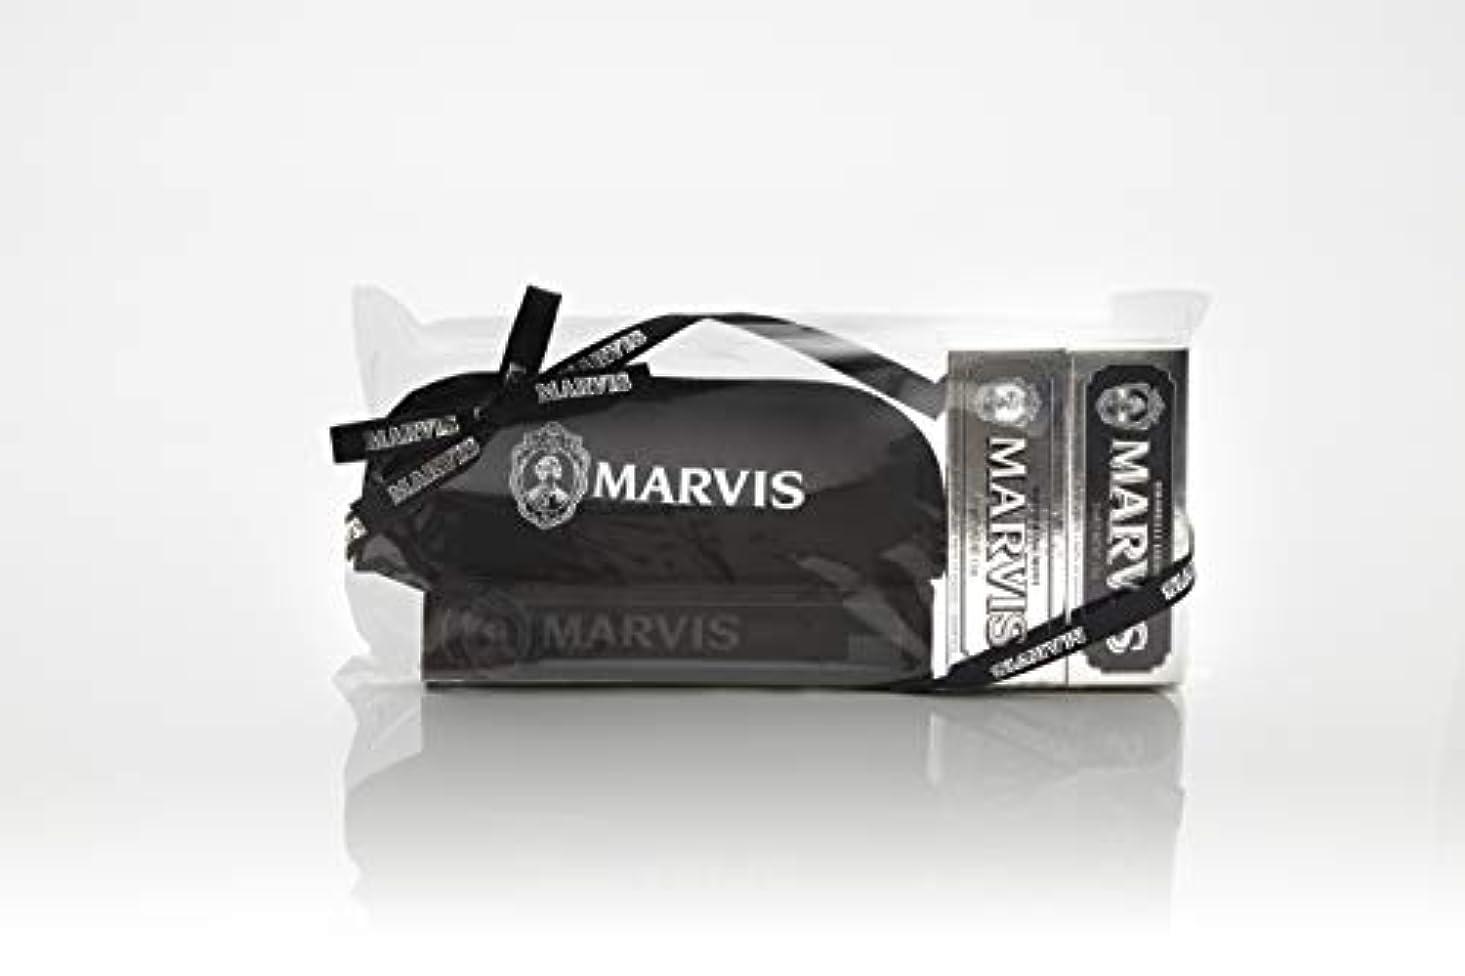 MARVIS(マービス) トラベル?セットDouble Flavors (歯みがき粉?歯ブラシ?ポー